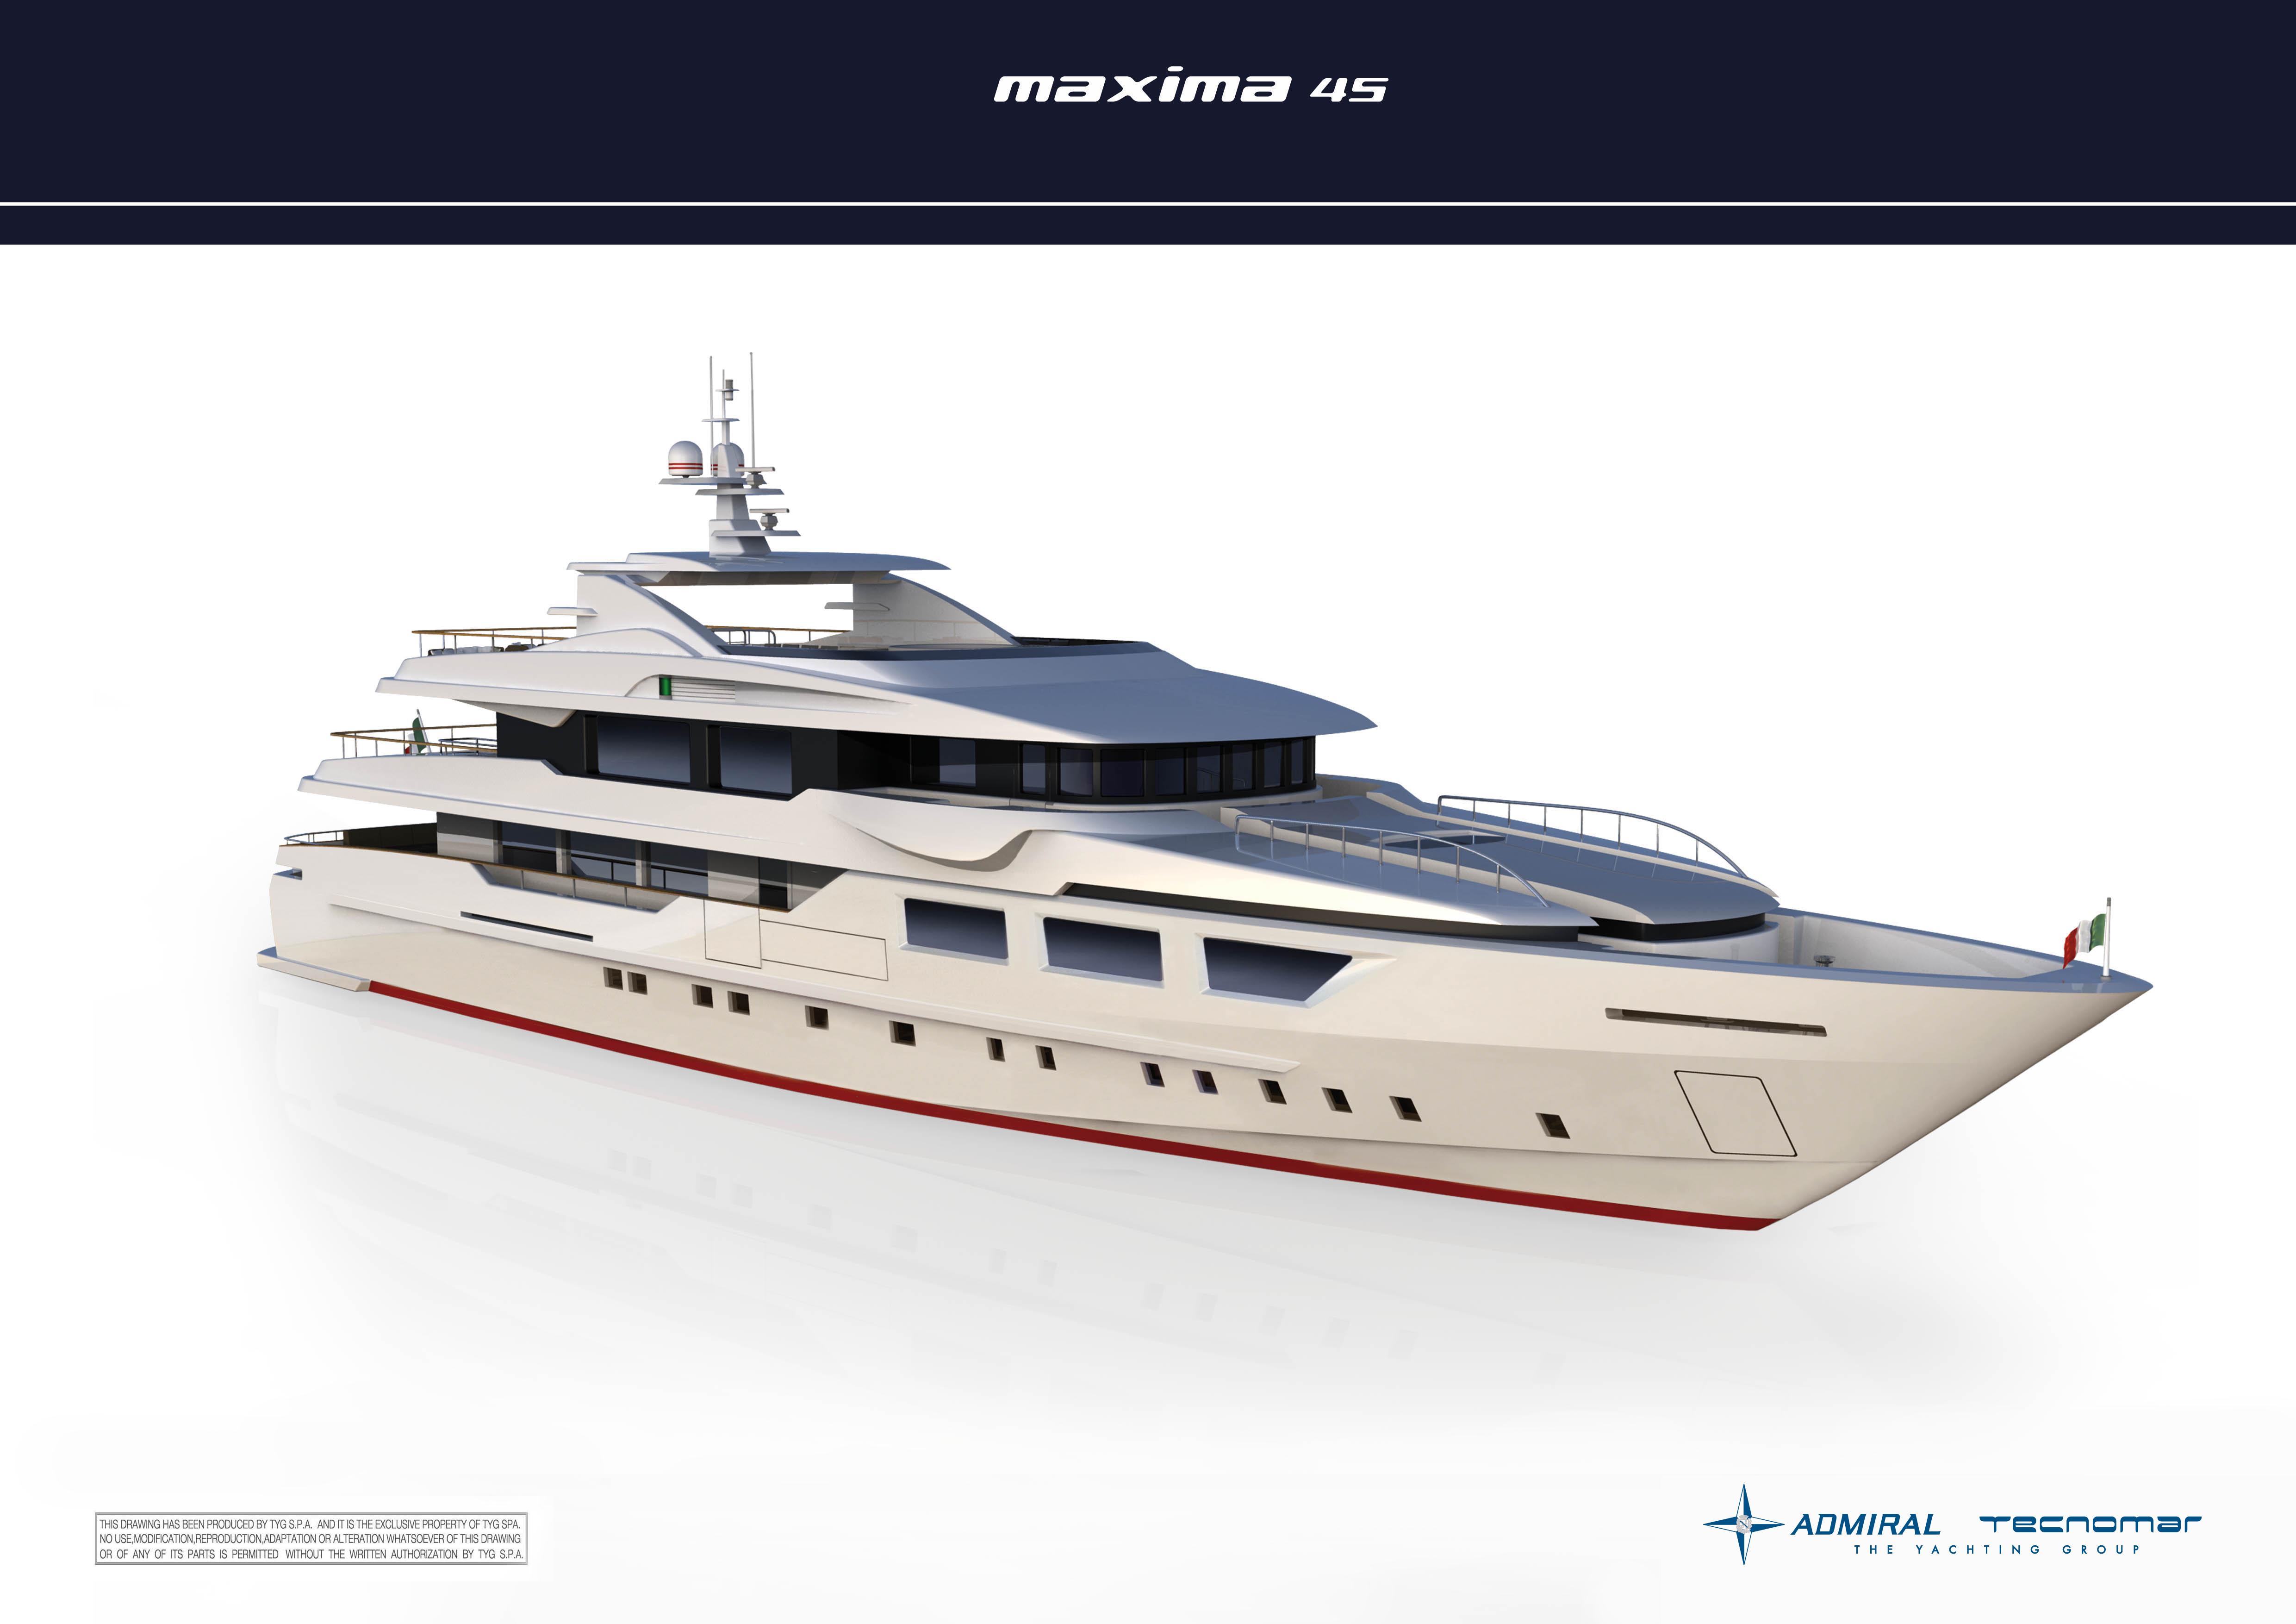 45m luxury motor yacht MAXIMA 45 by Admiral Tecnomar Group